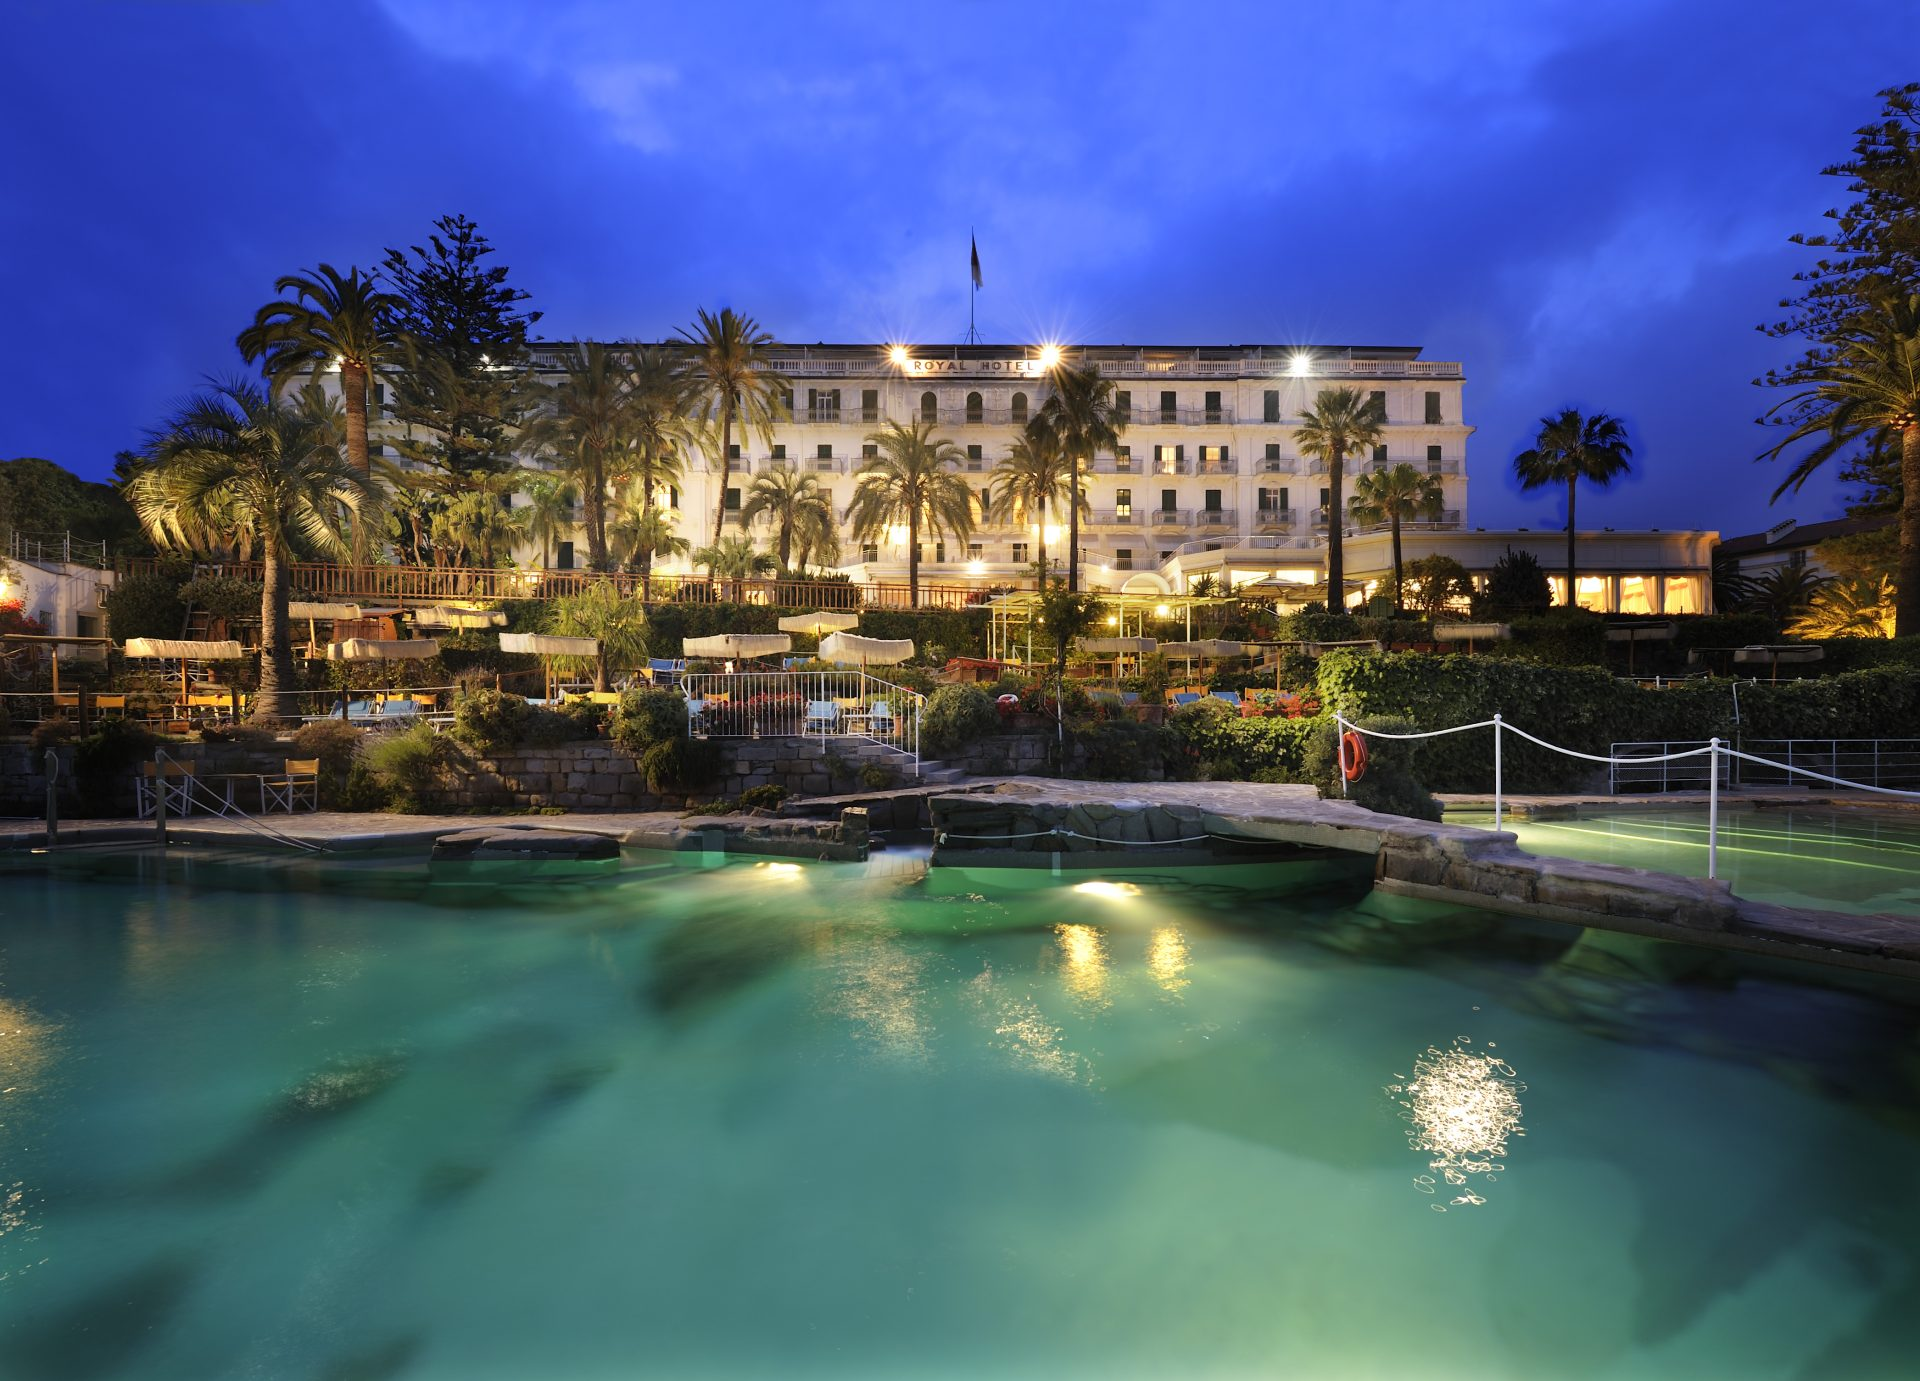 2 Tage im Hotel Royal San Remo